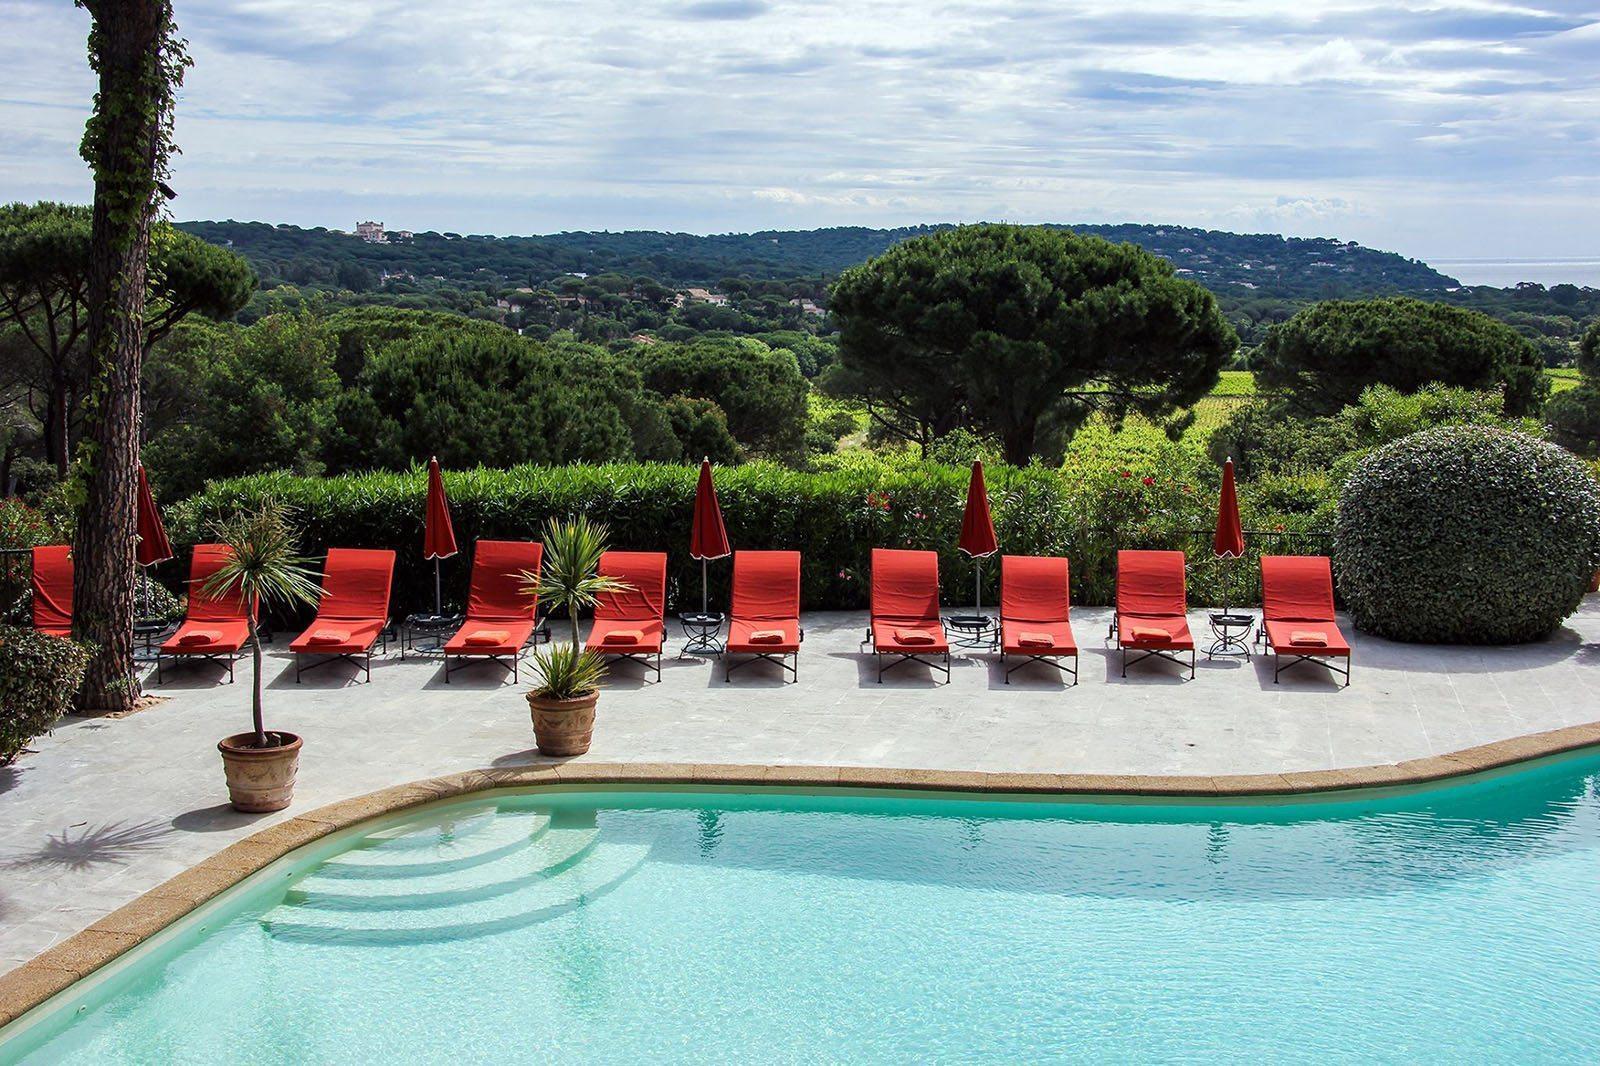 villa-marie-hotel-luxe-piscine-lagon-suites-restaurant-parc1